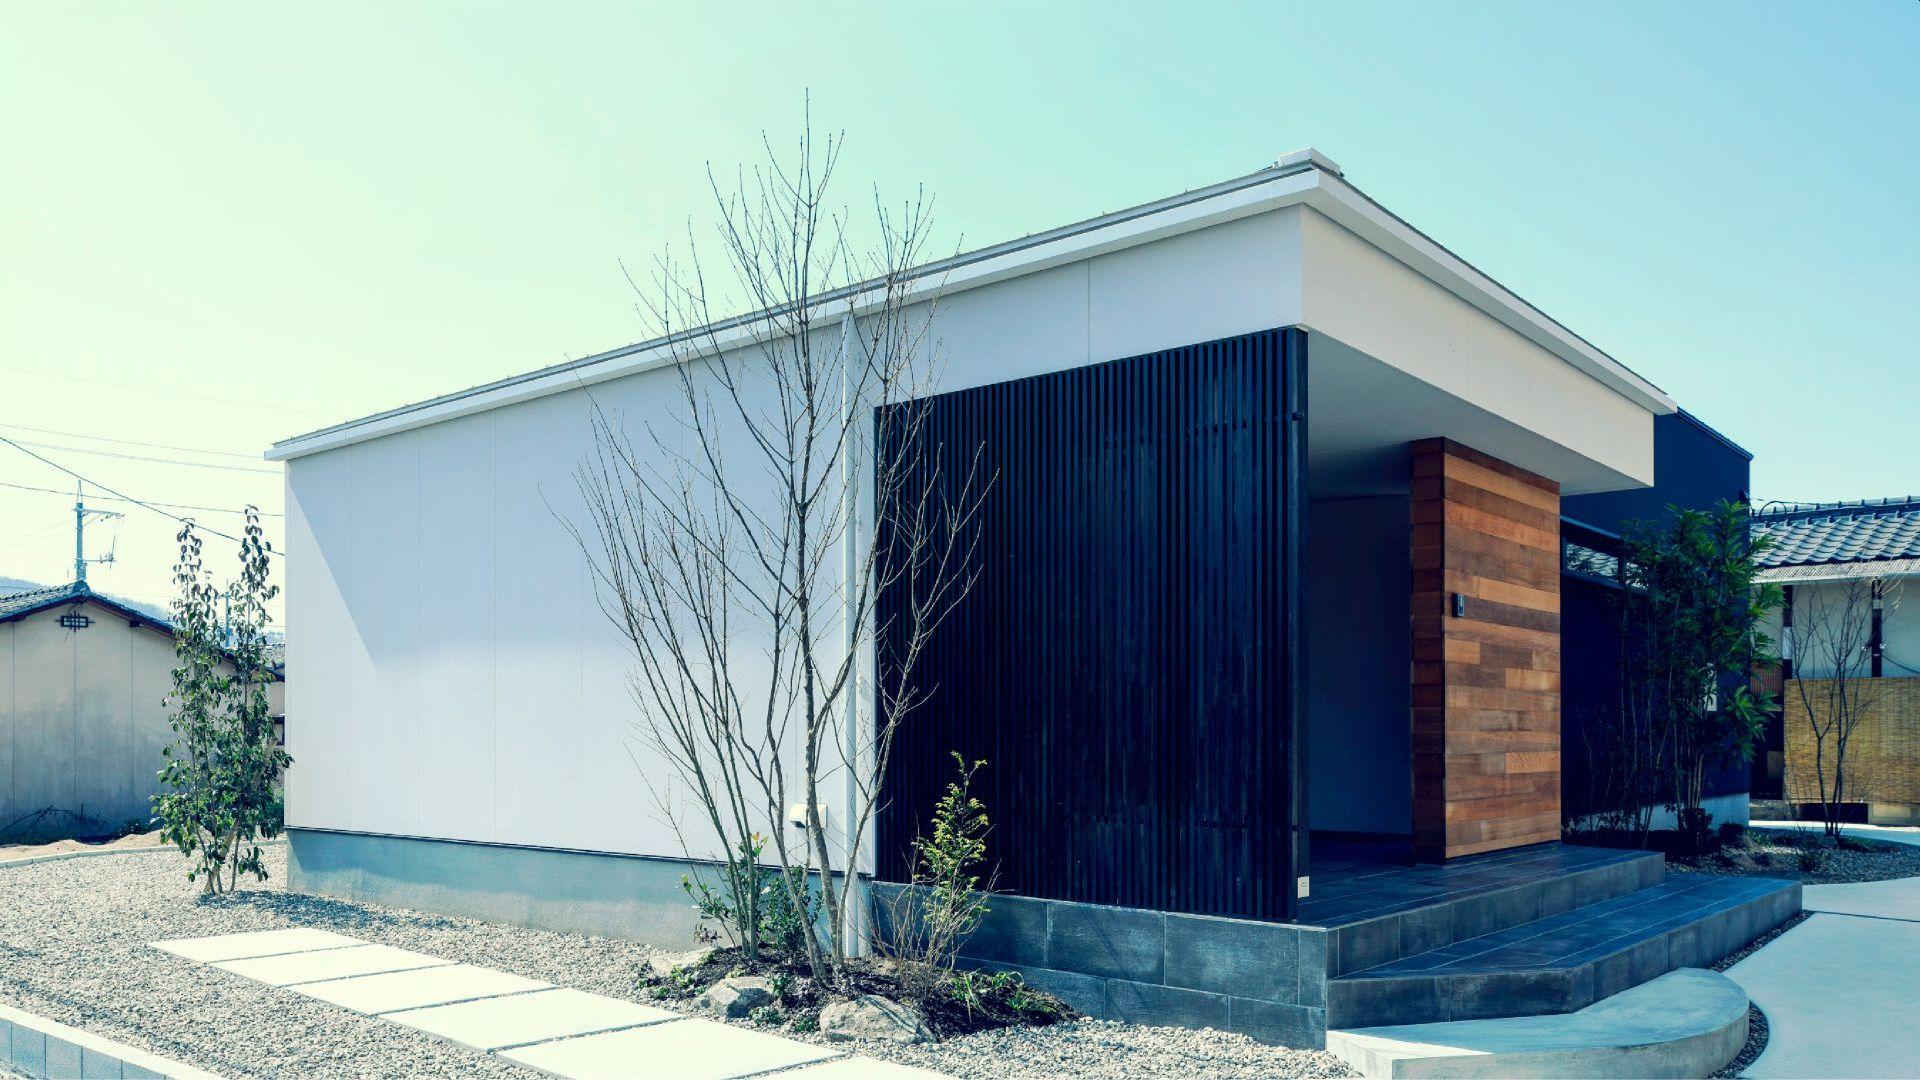 Kenboの特徴的な建築